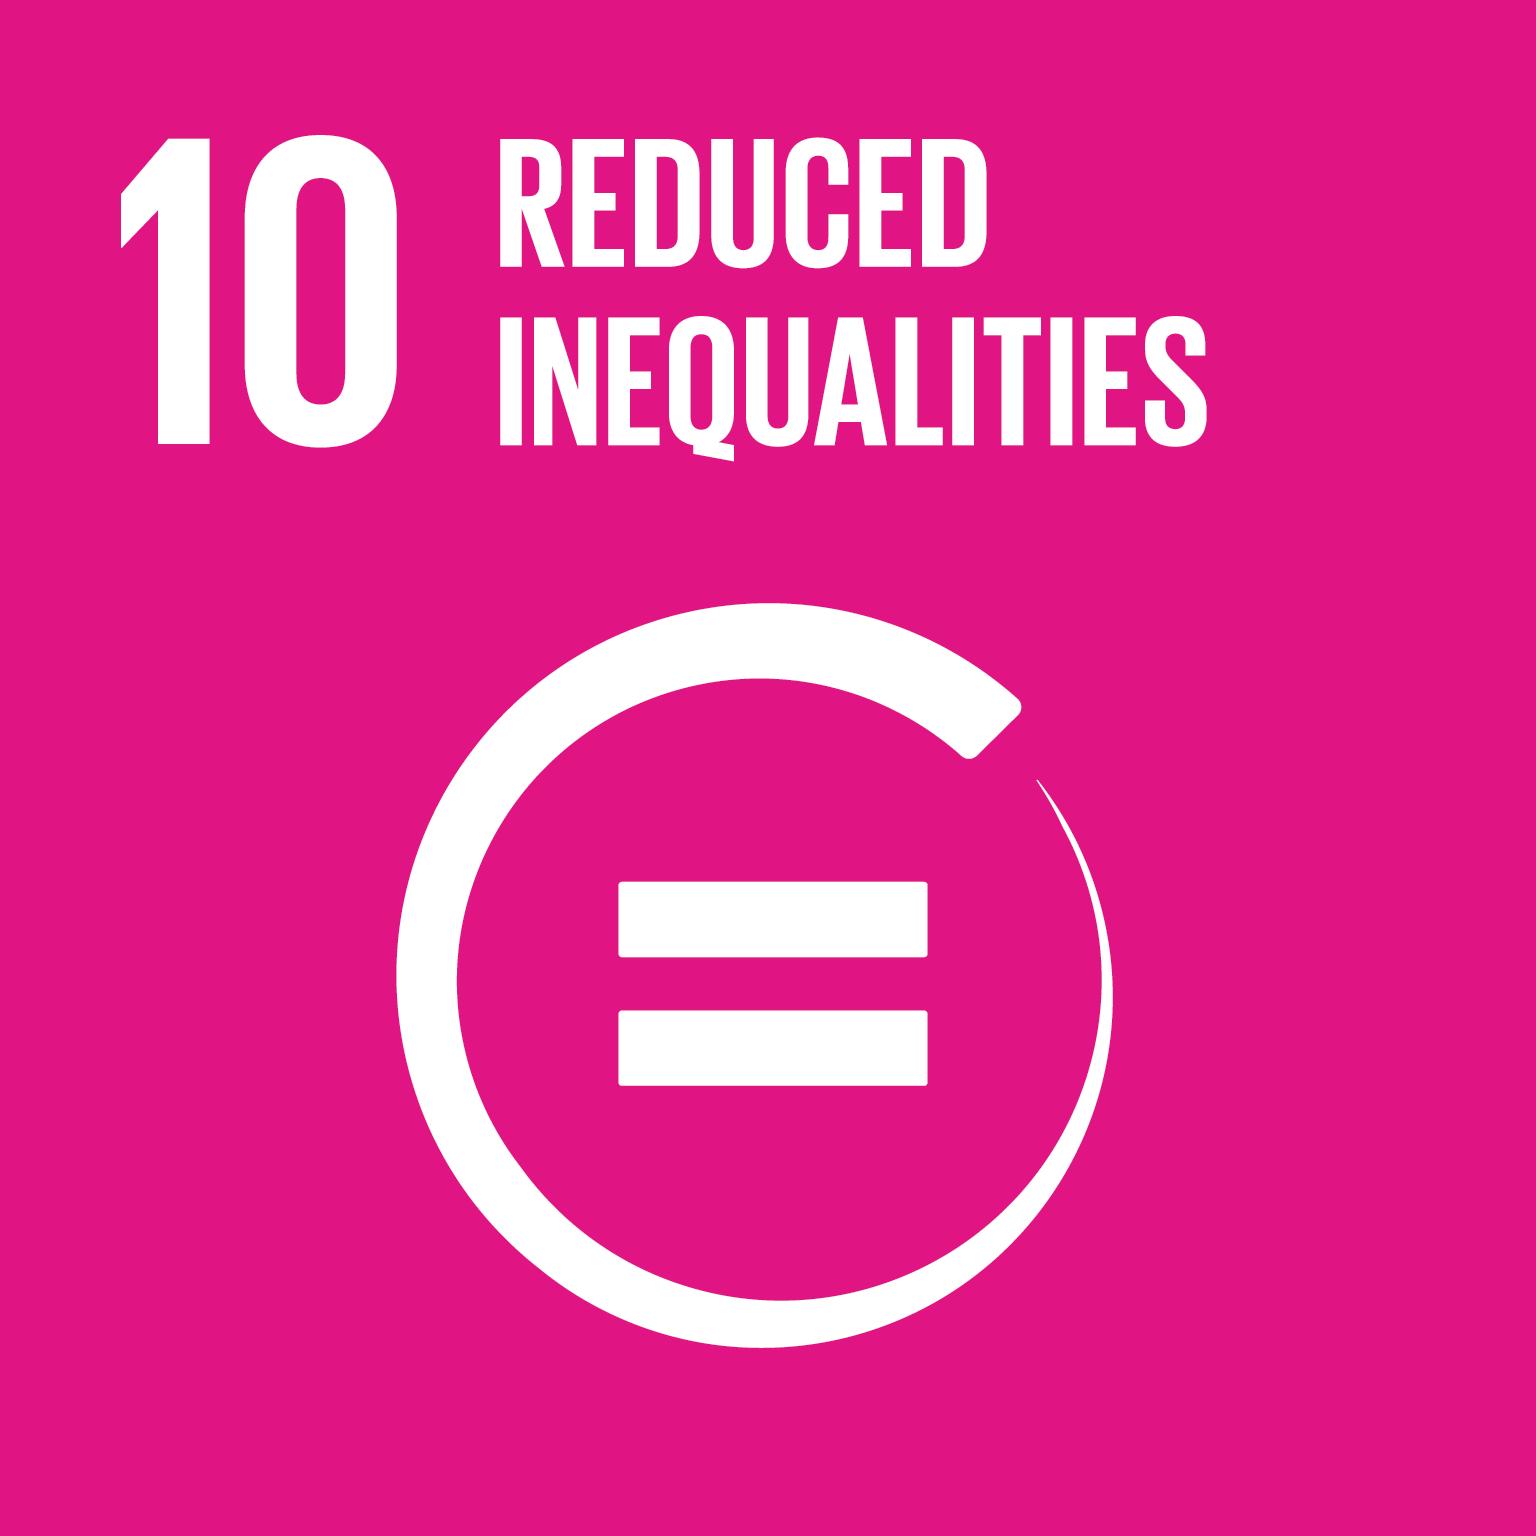 Reduce Inequalities (10)